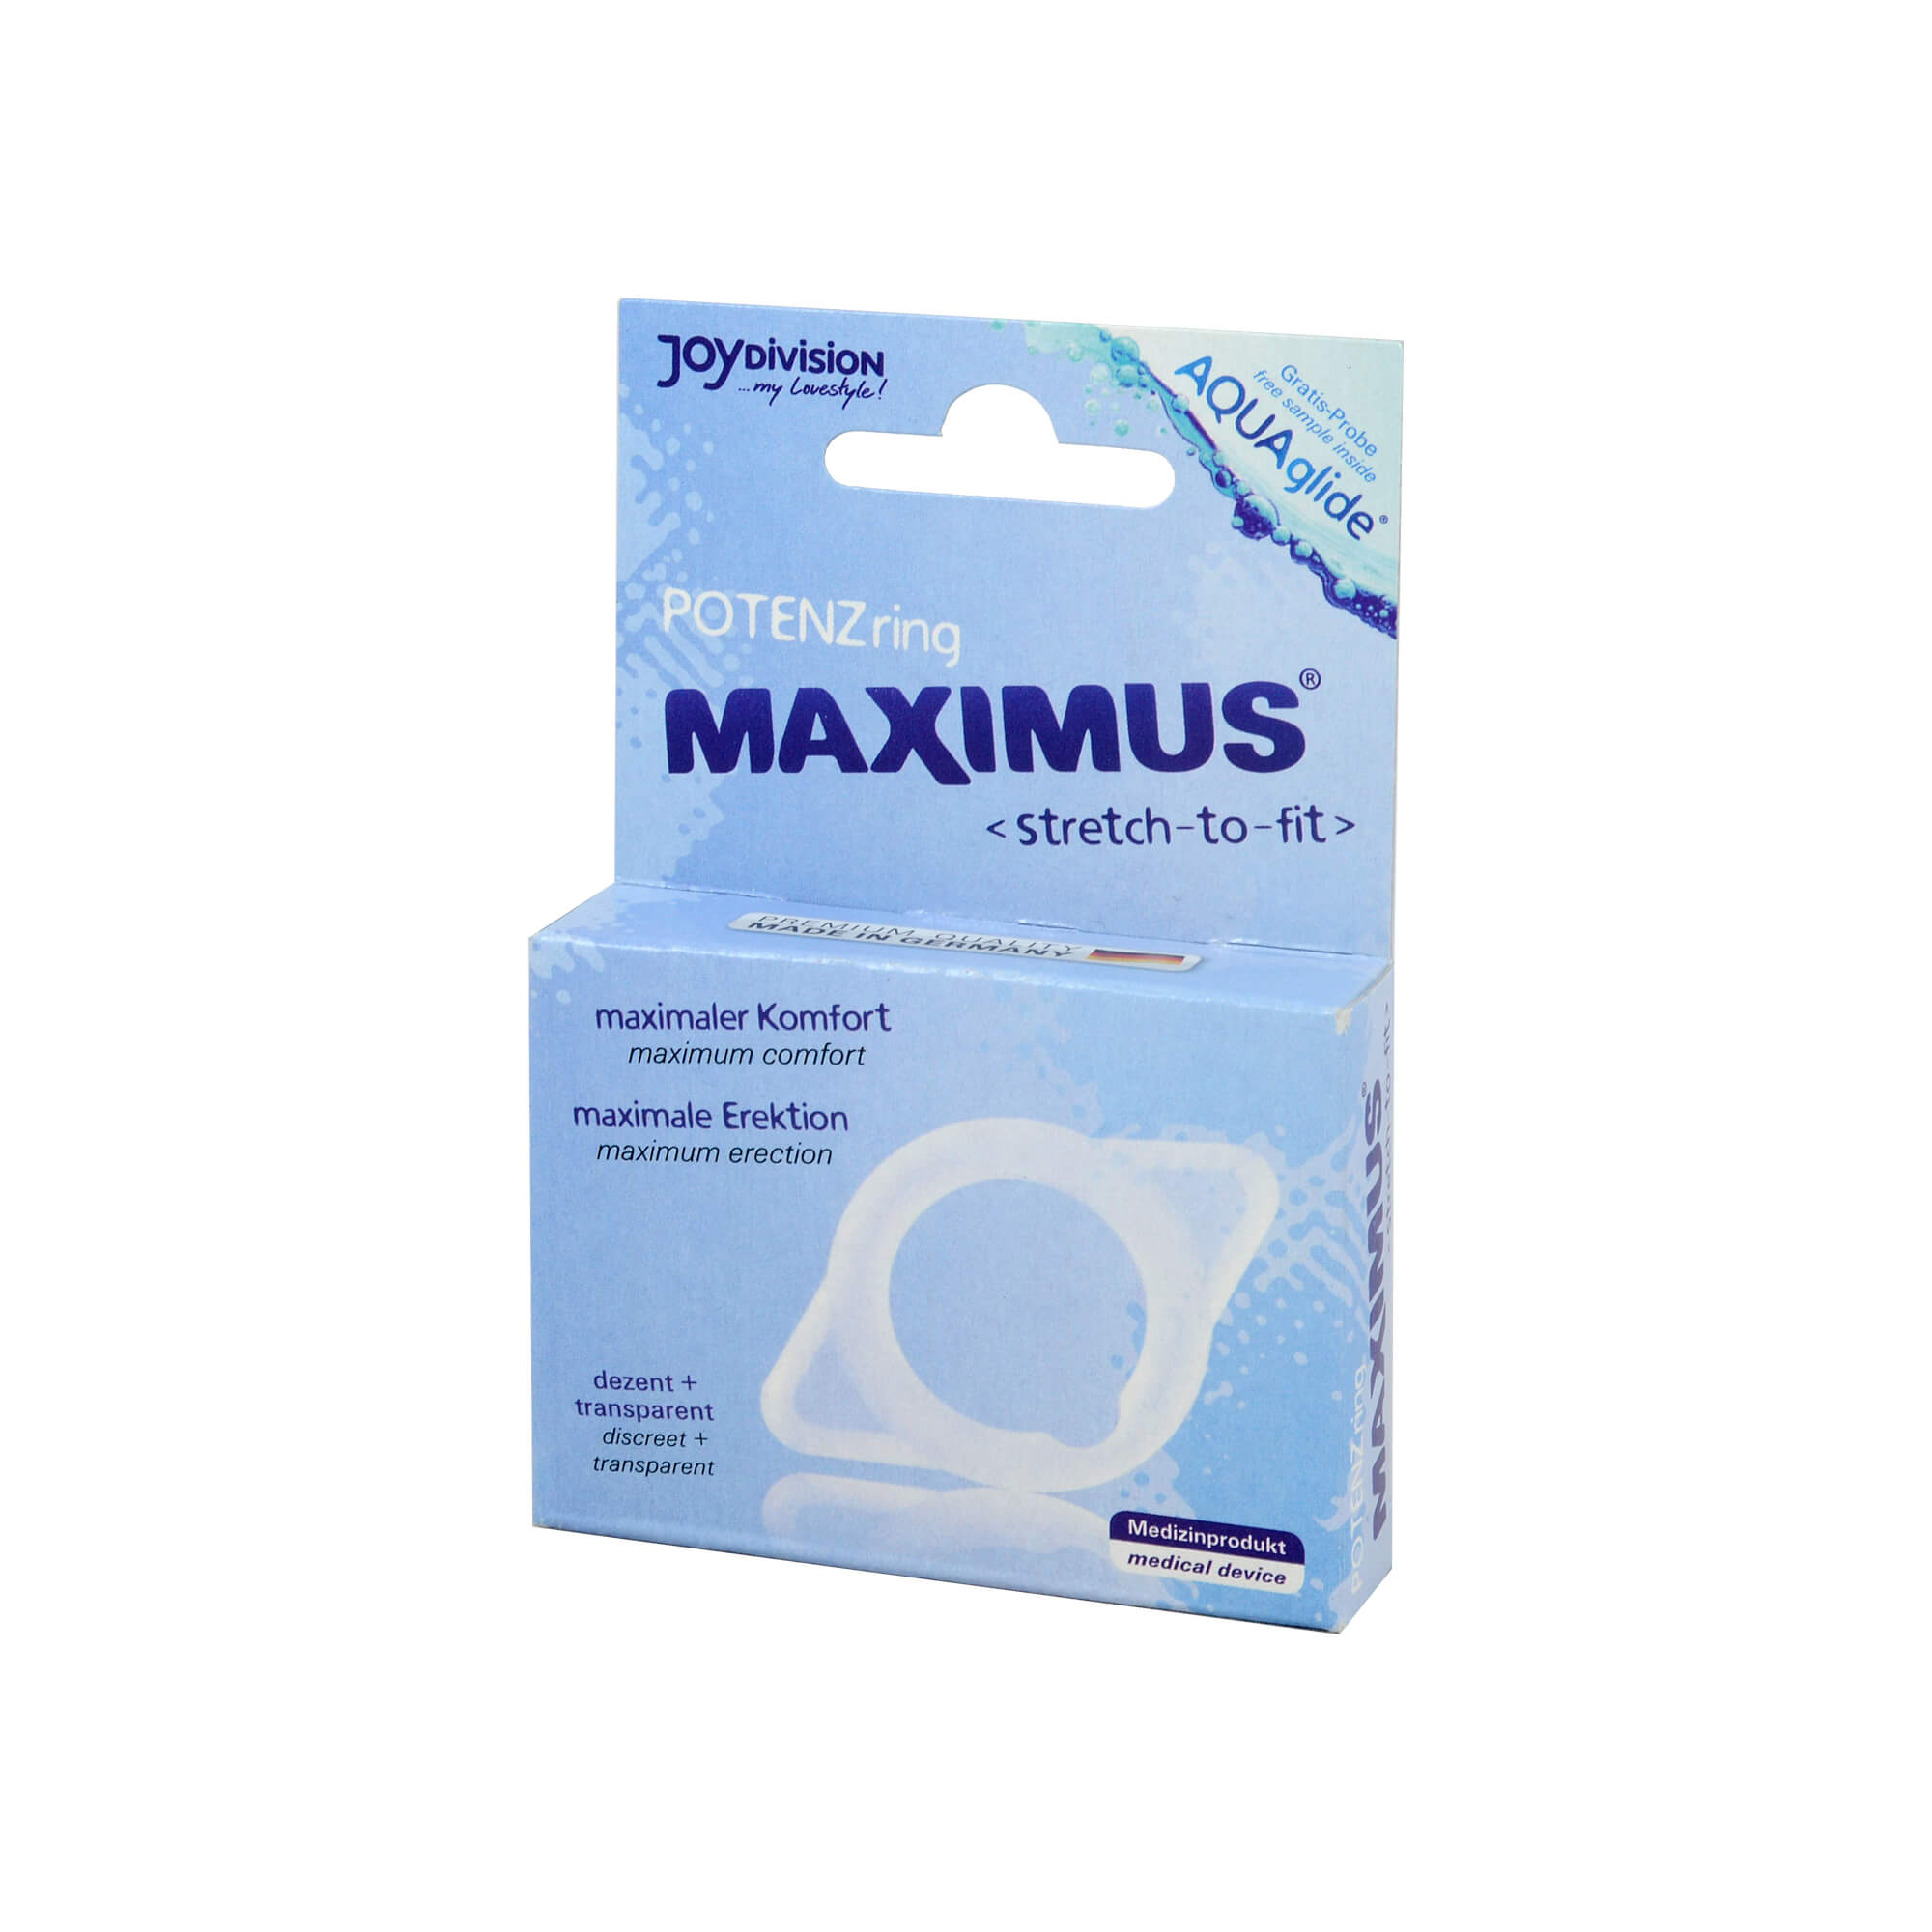 Maximus der Potenzring M